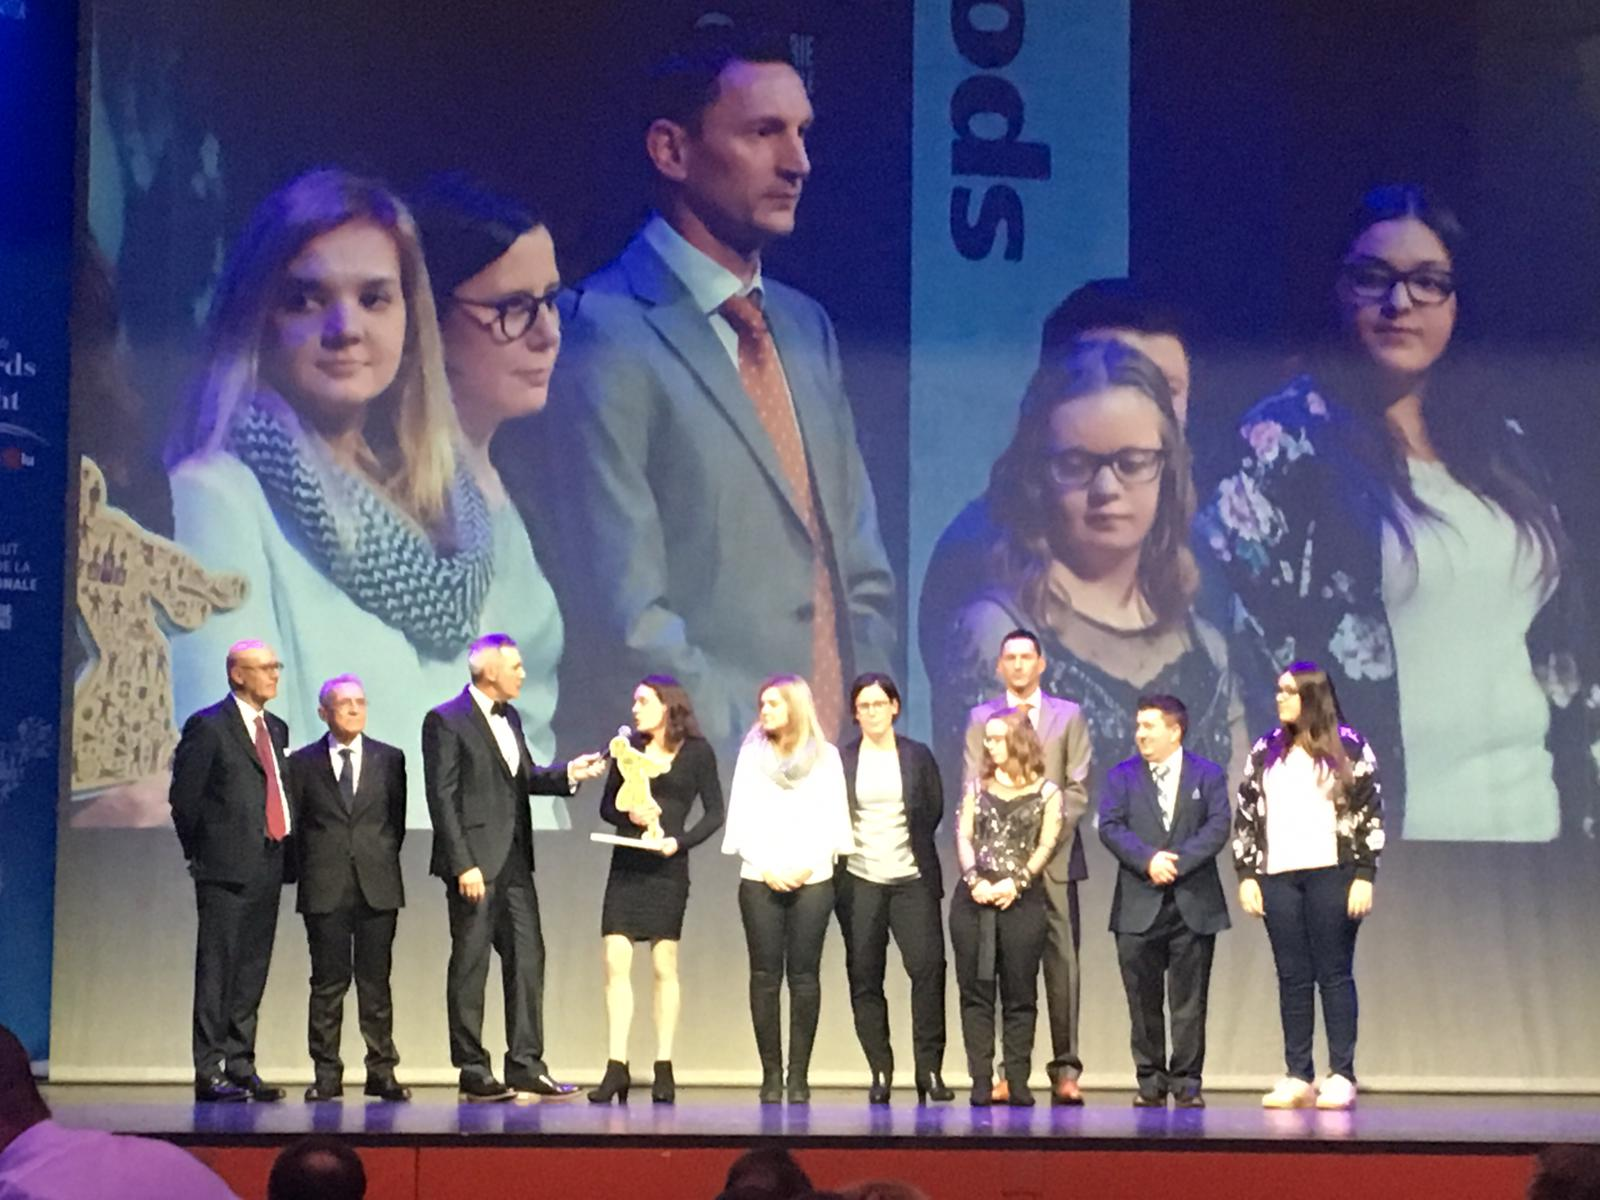 Prix Sport et Handicap pour Special Olympics Luxembourg Unified Sports